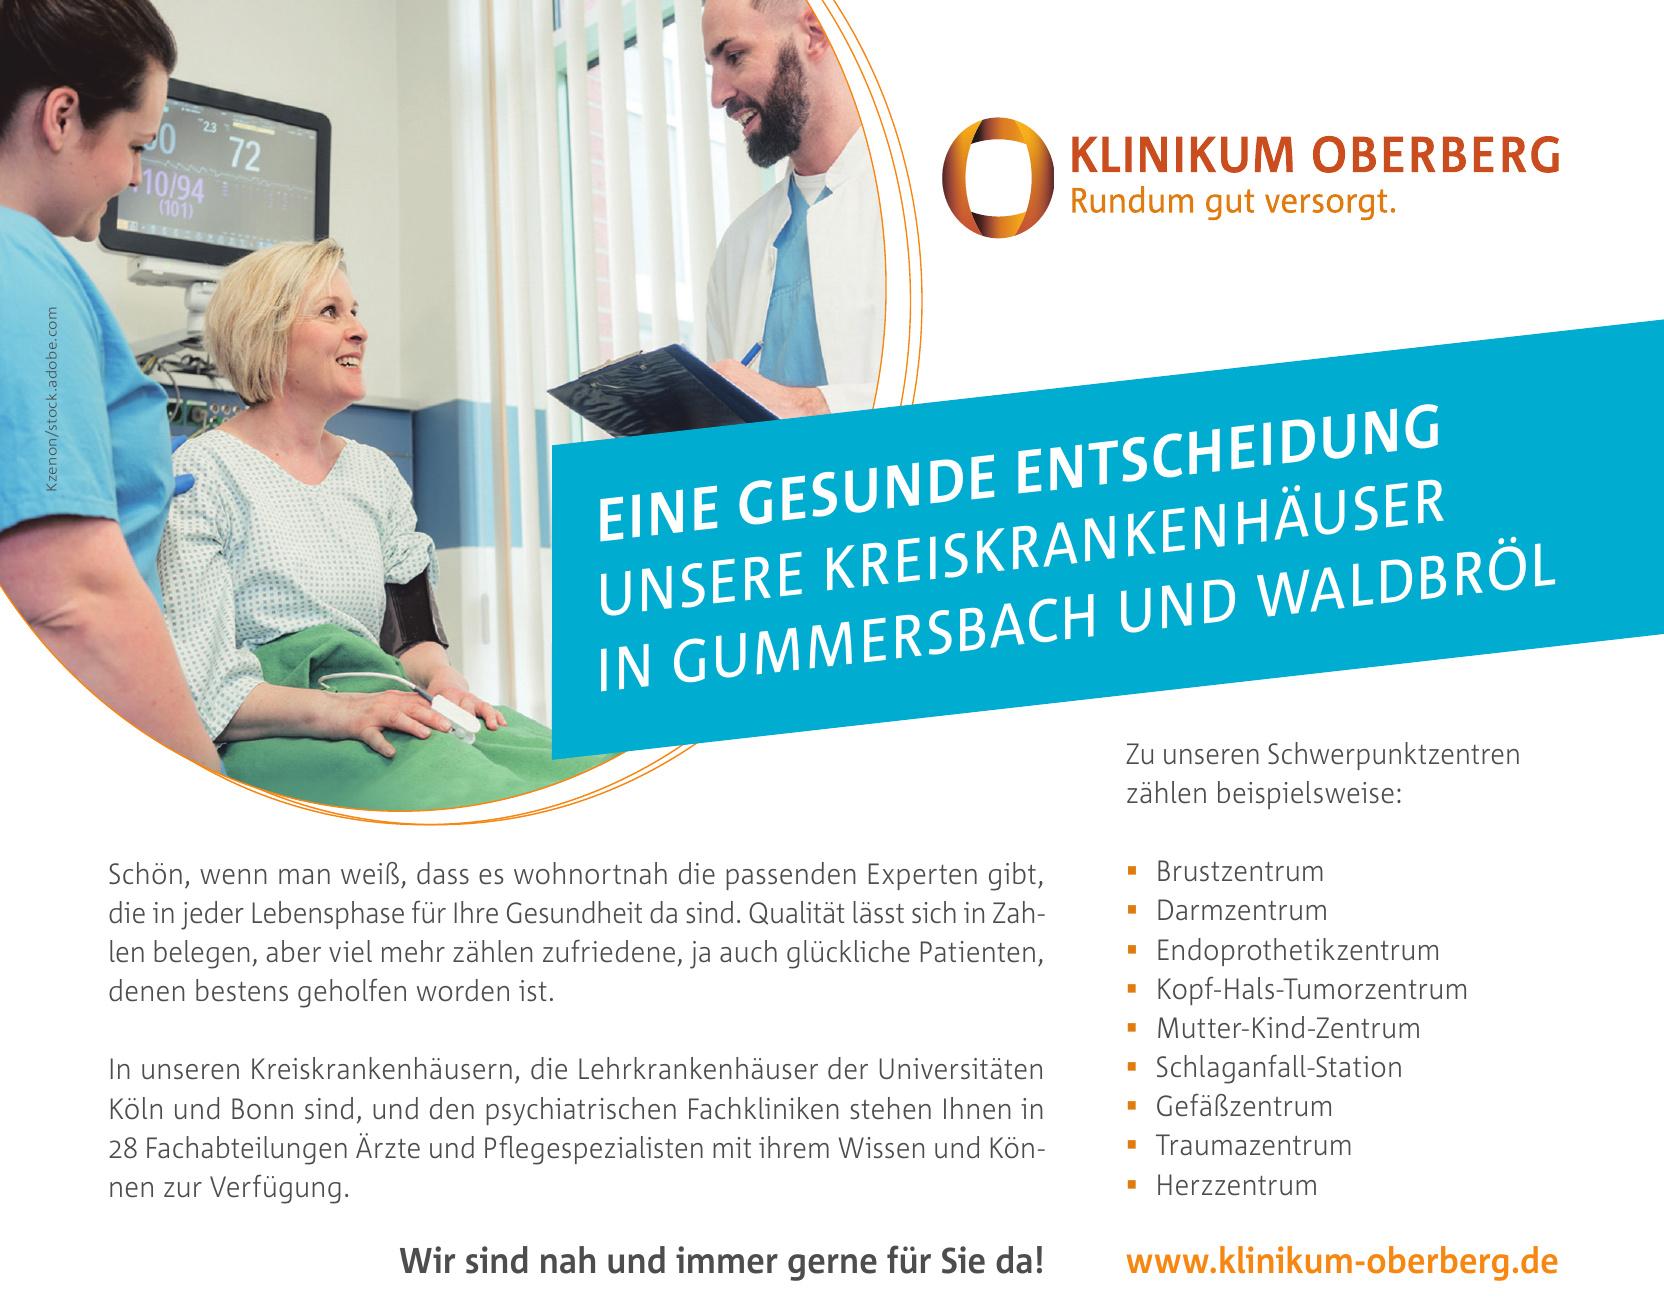 Klinikum Oberberg